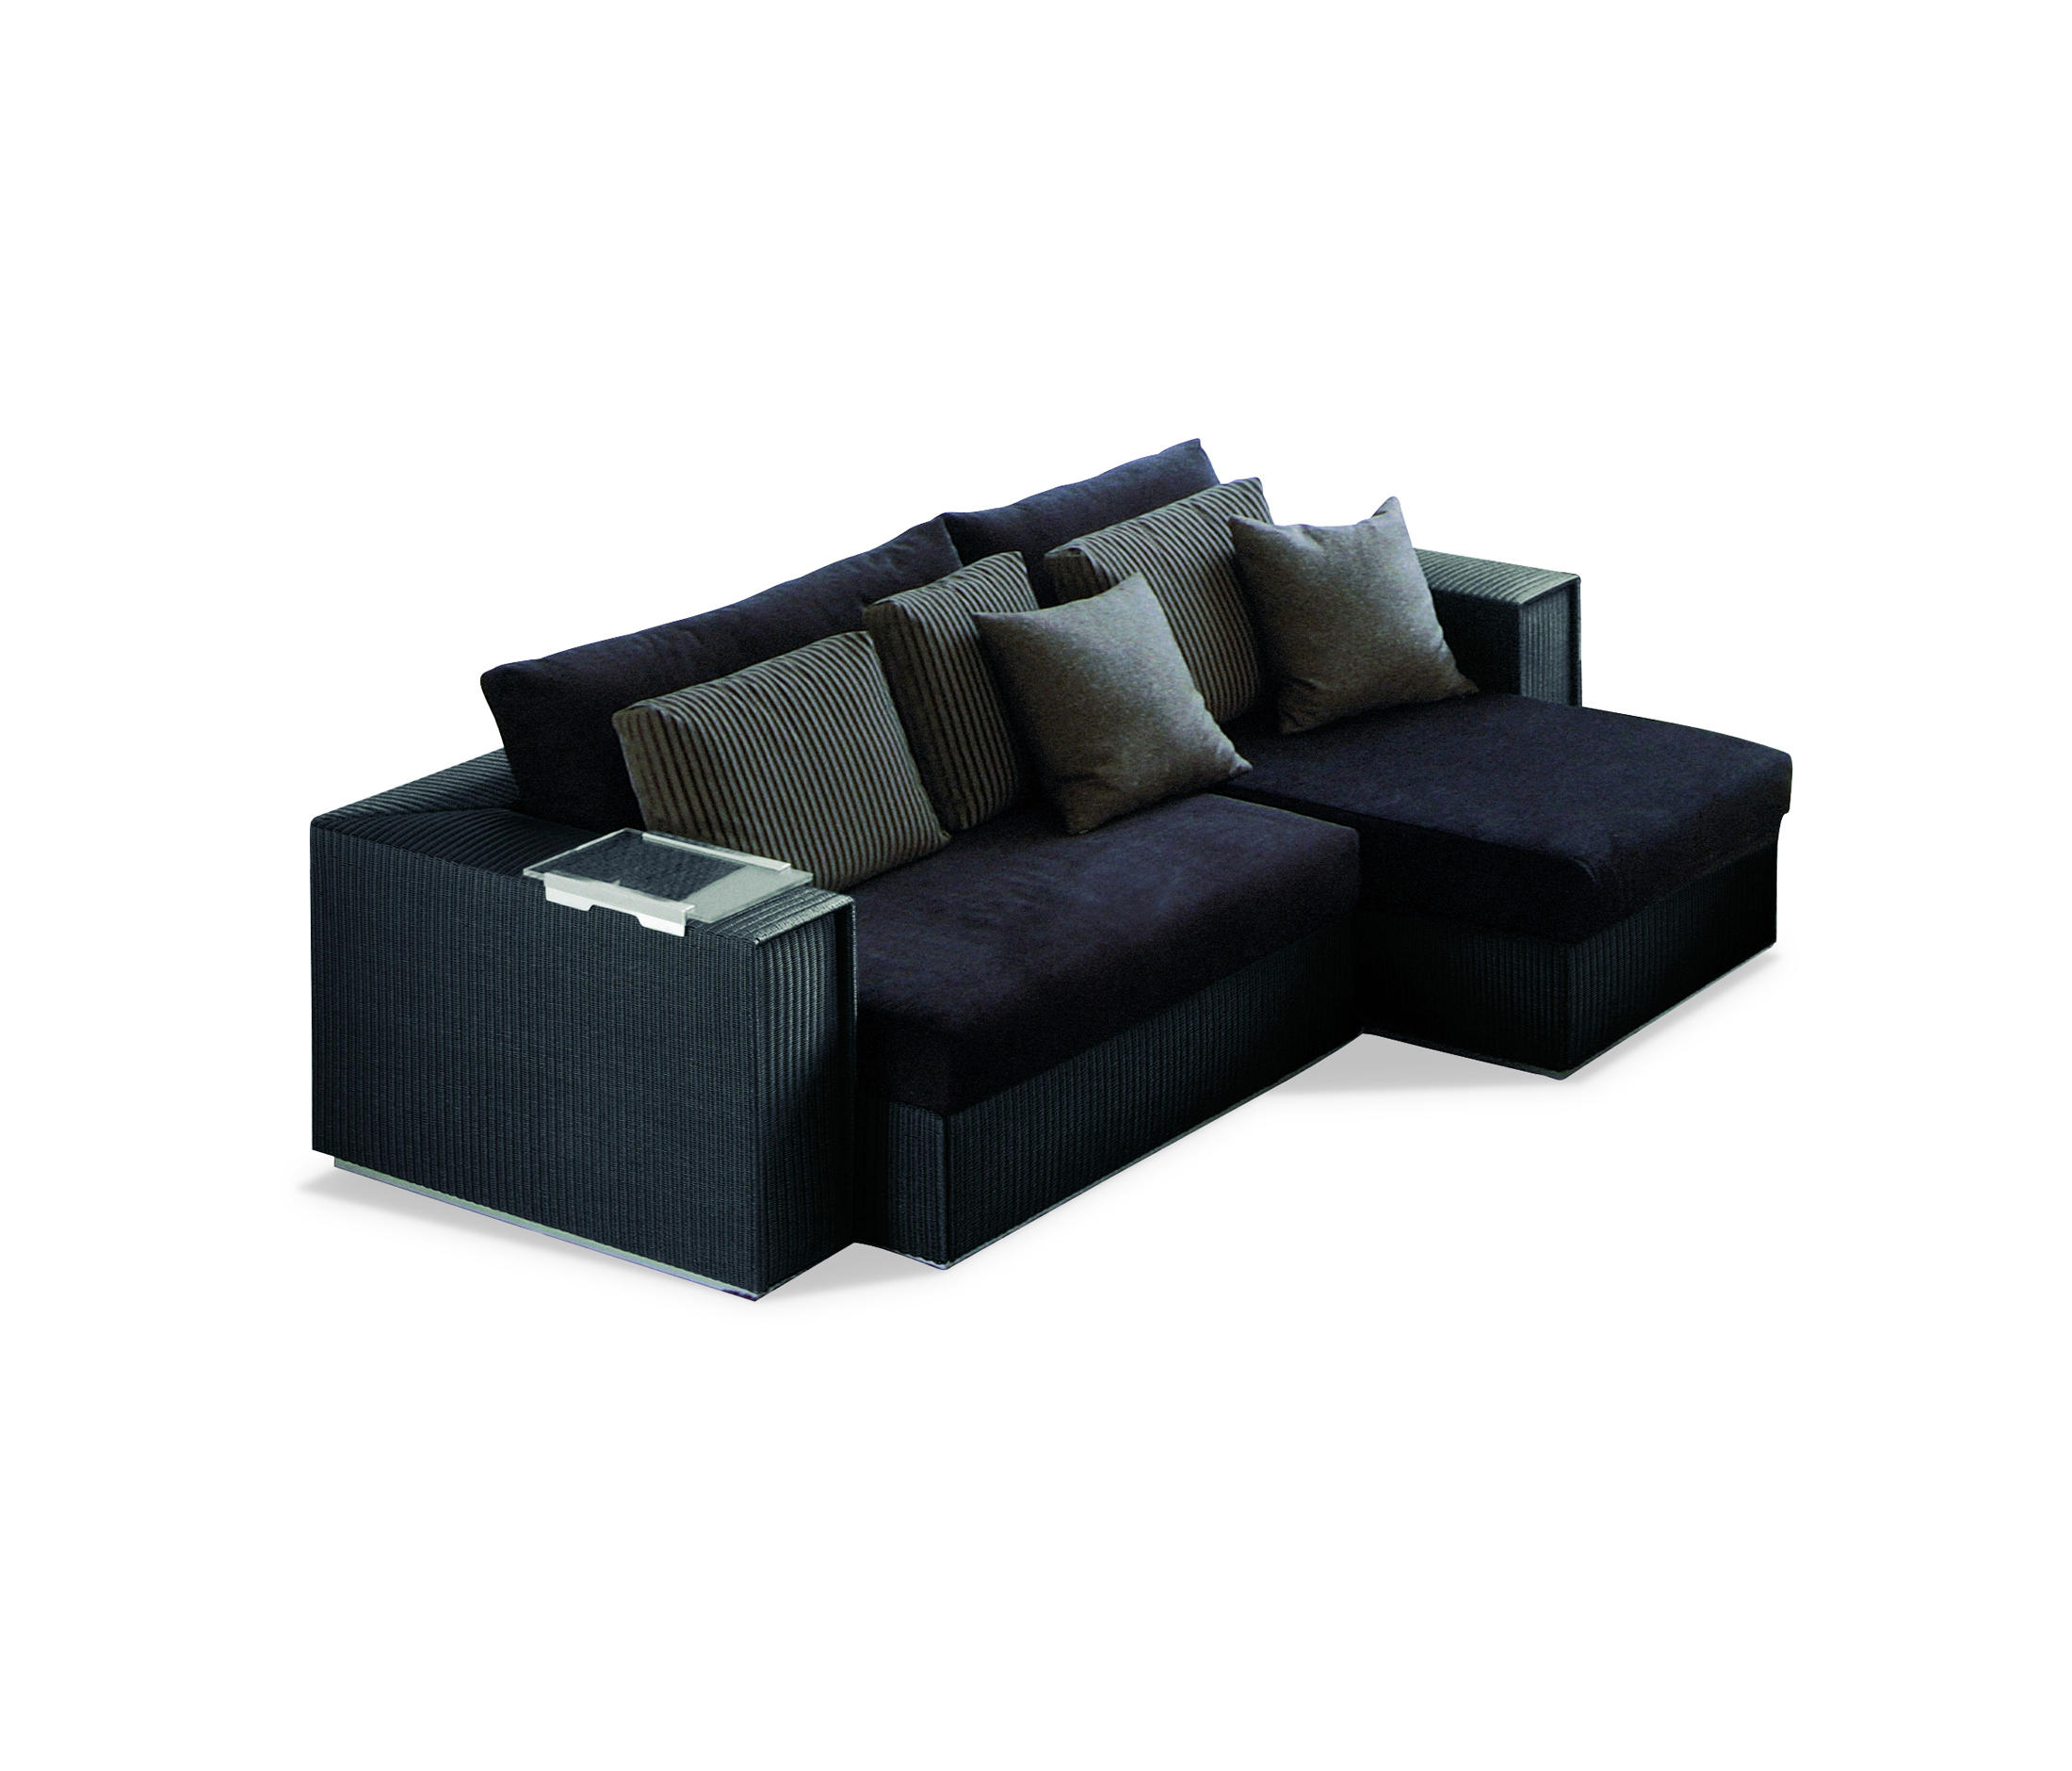 loft large sofa by accente lounge sofas - Large Sofas